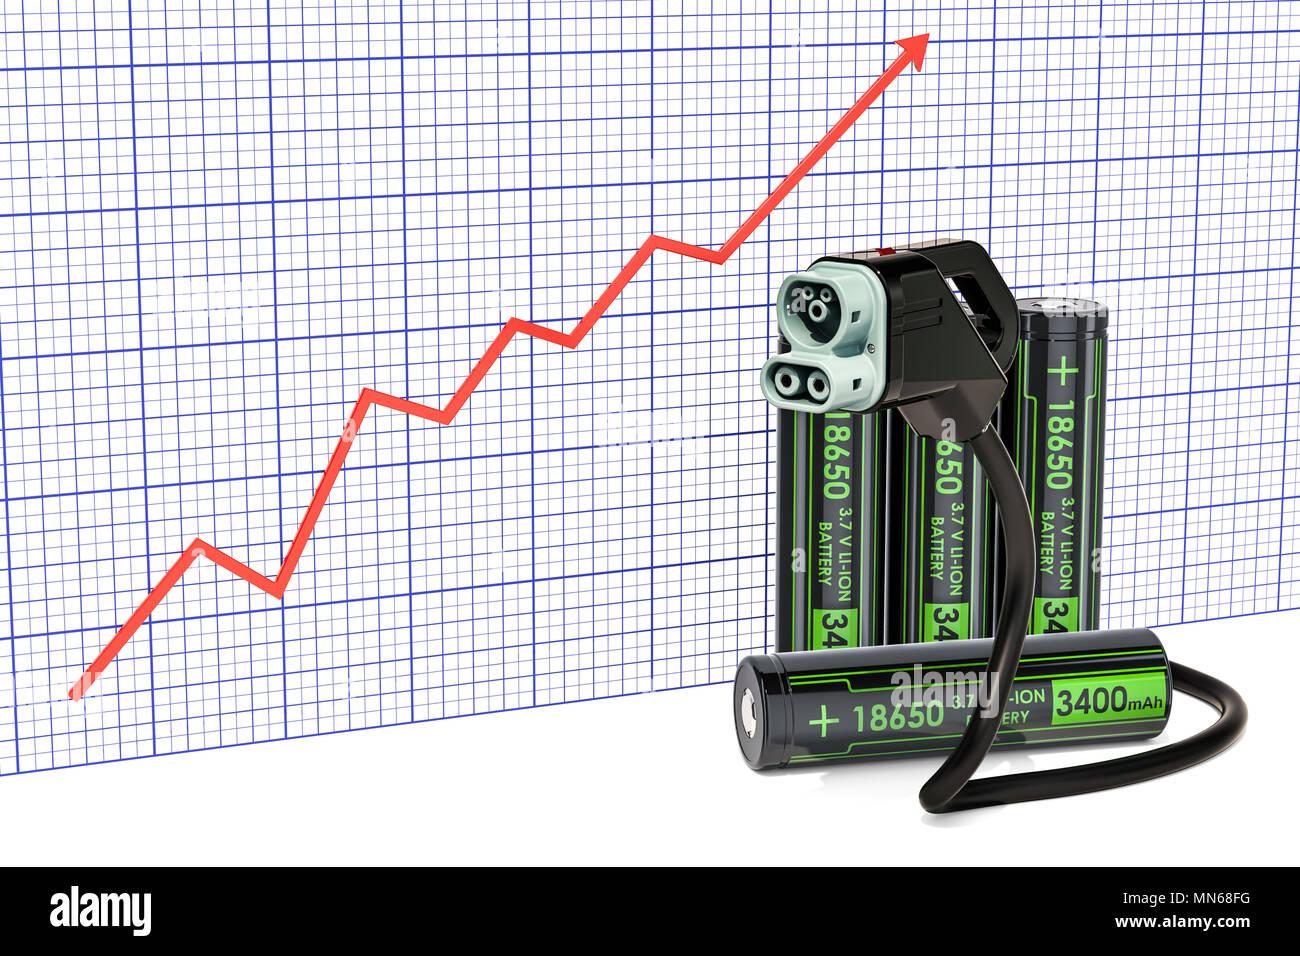 Electric Car Battery Diagram Stock Photos & Electric Car Battery ...